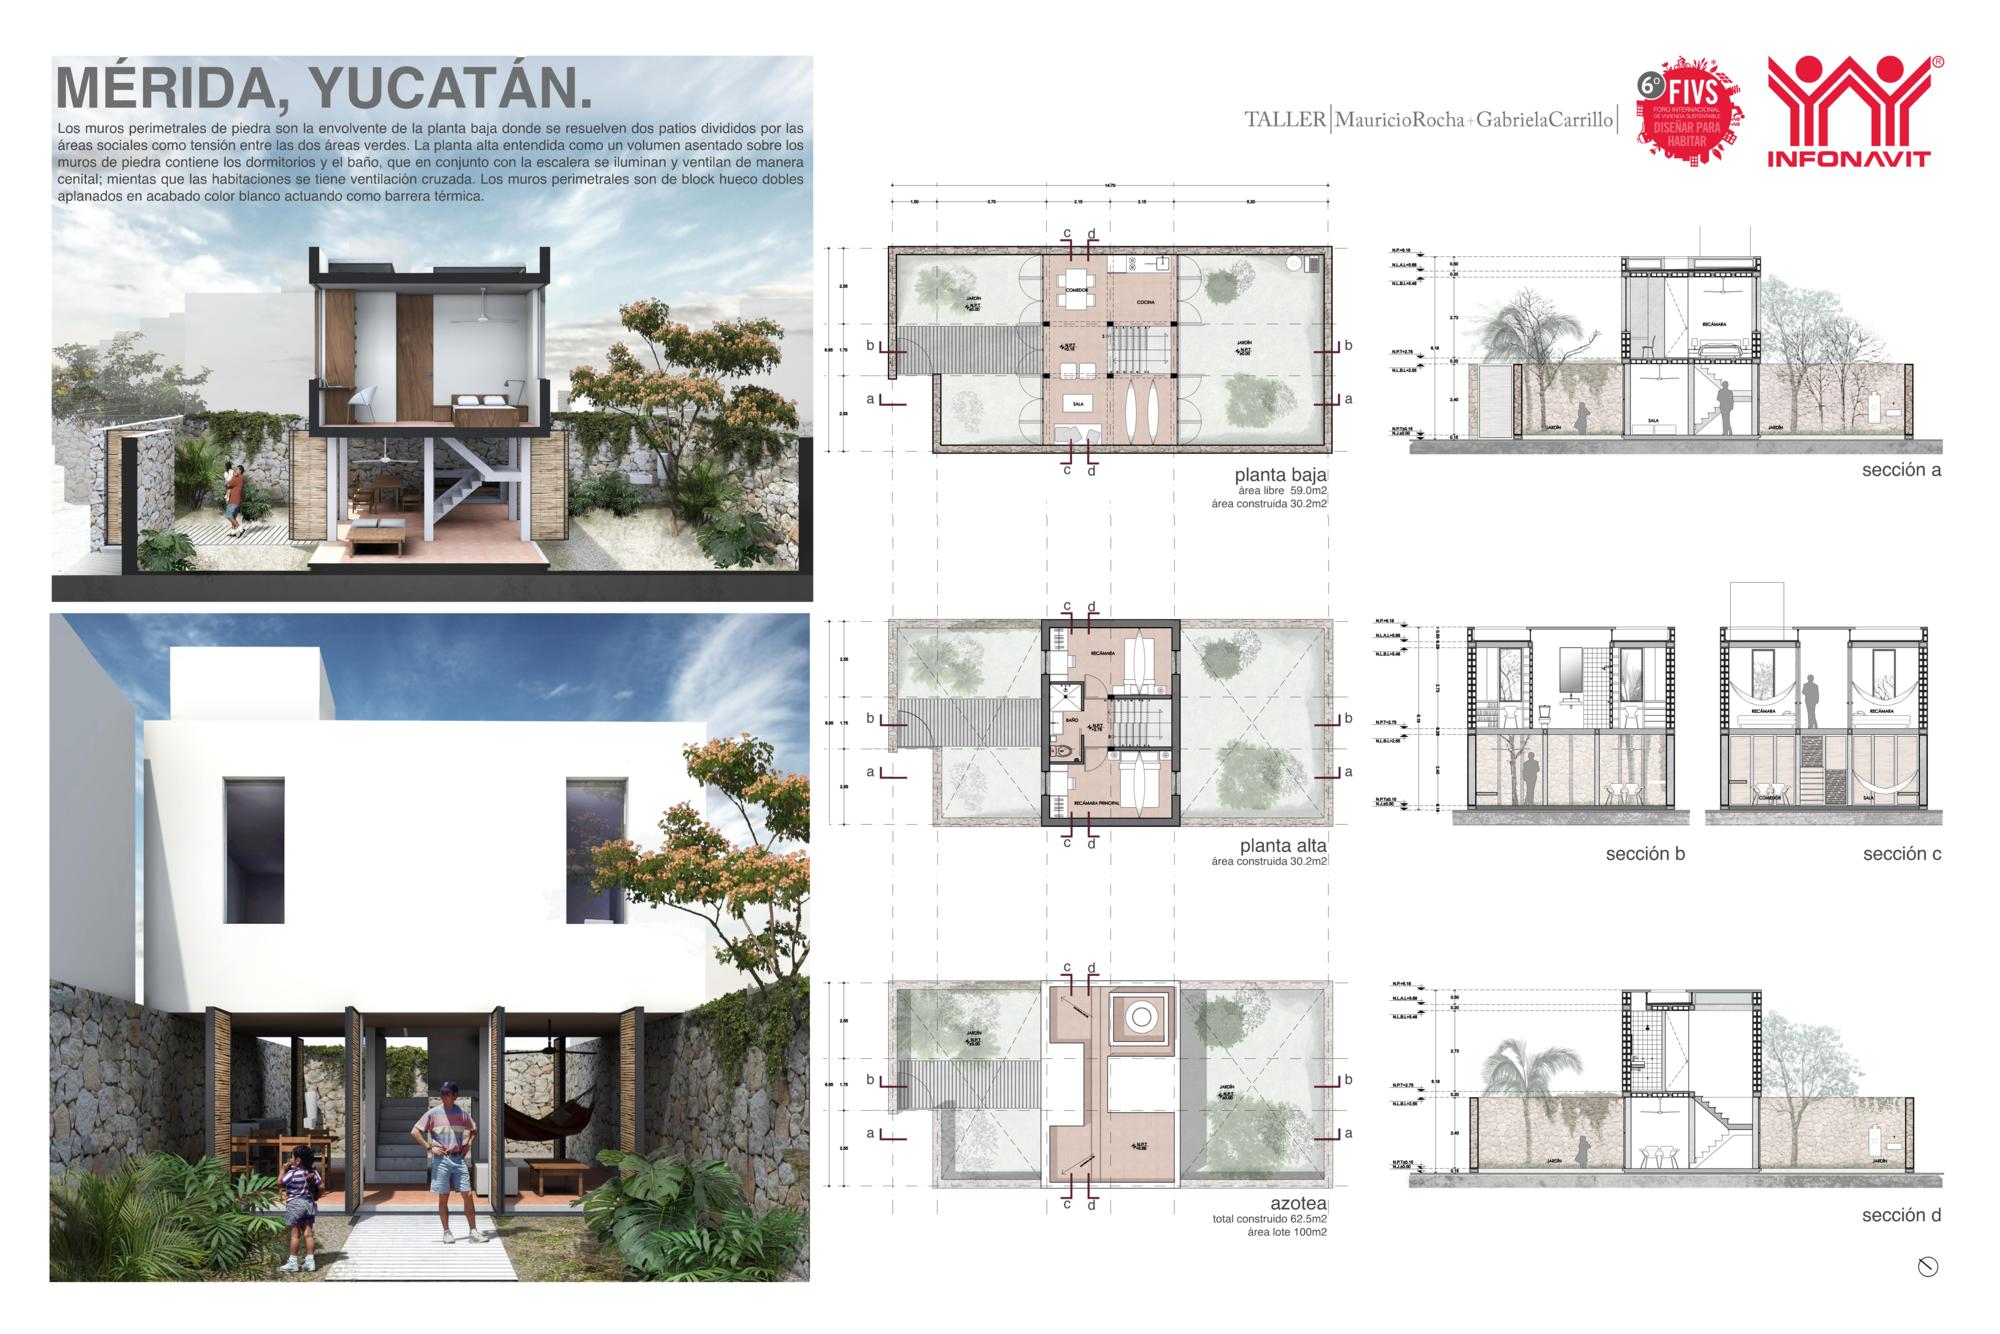 © Taller de Arquitectura Mauricio Rocha y Gabriela Carrillo